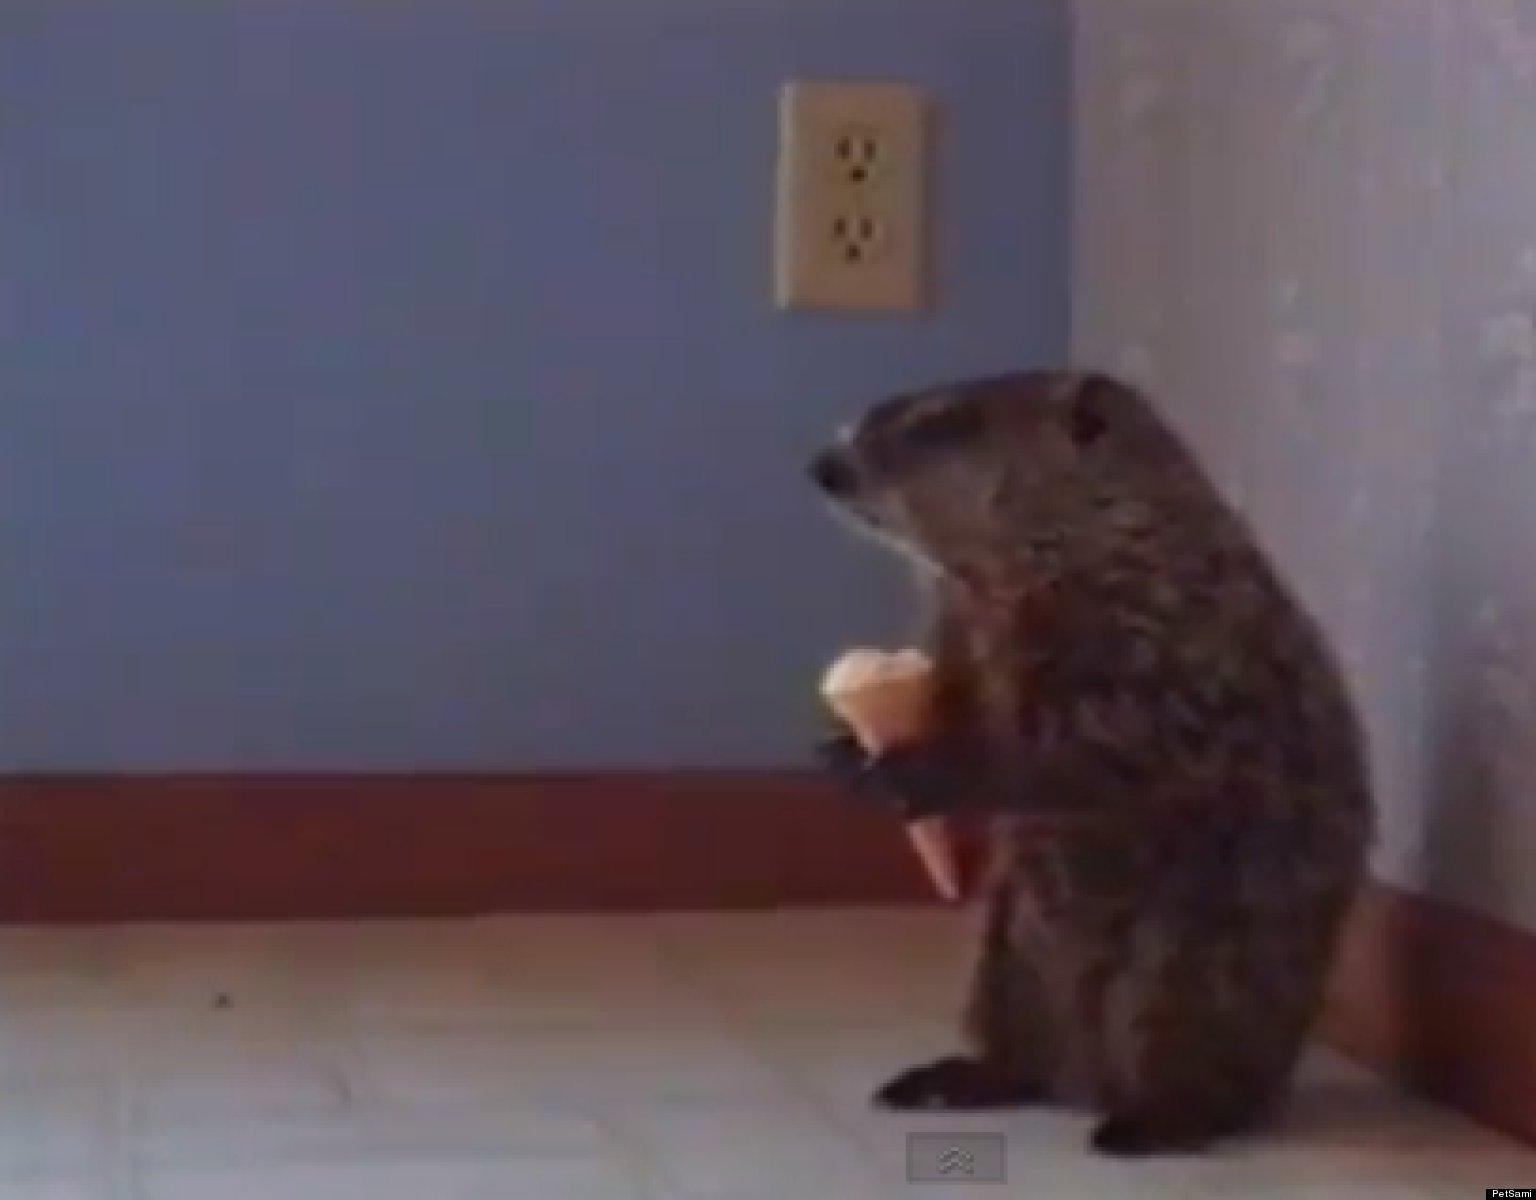 Uncategorized Woodchuck Video woodchuck eats an ice cream cone video huffpost